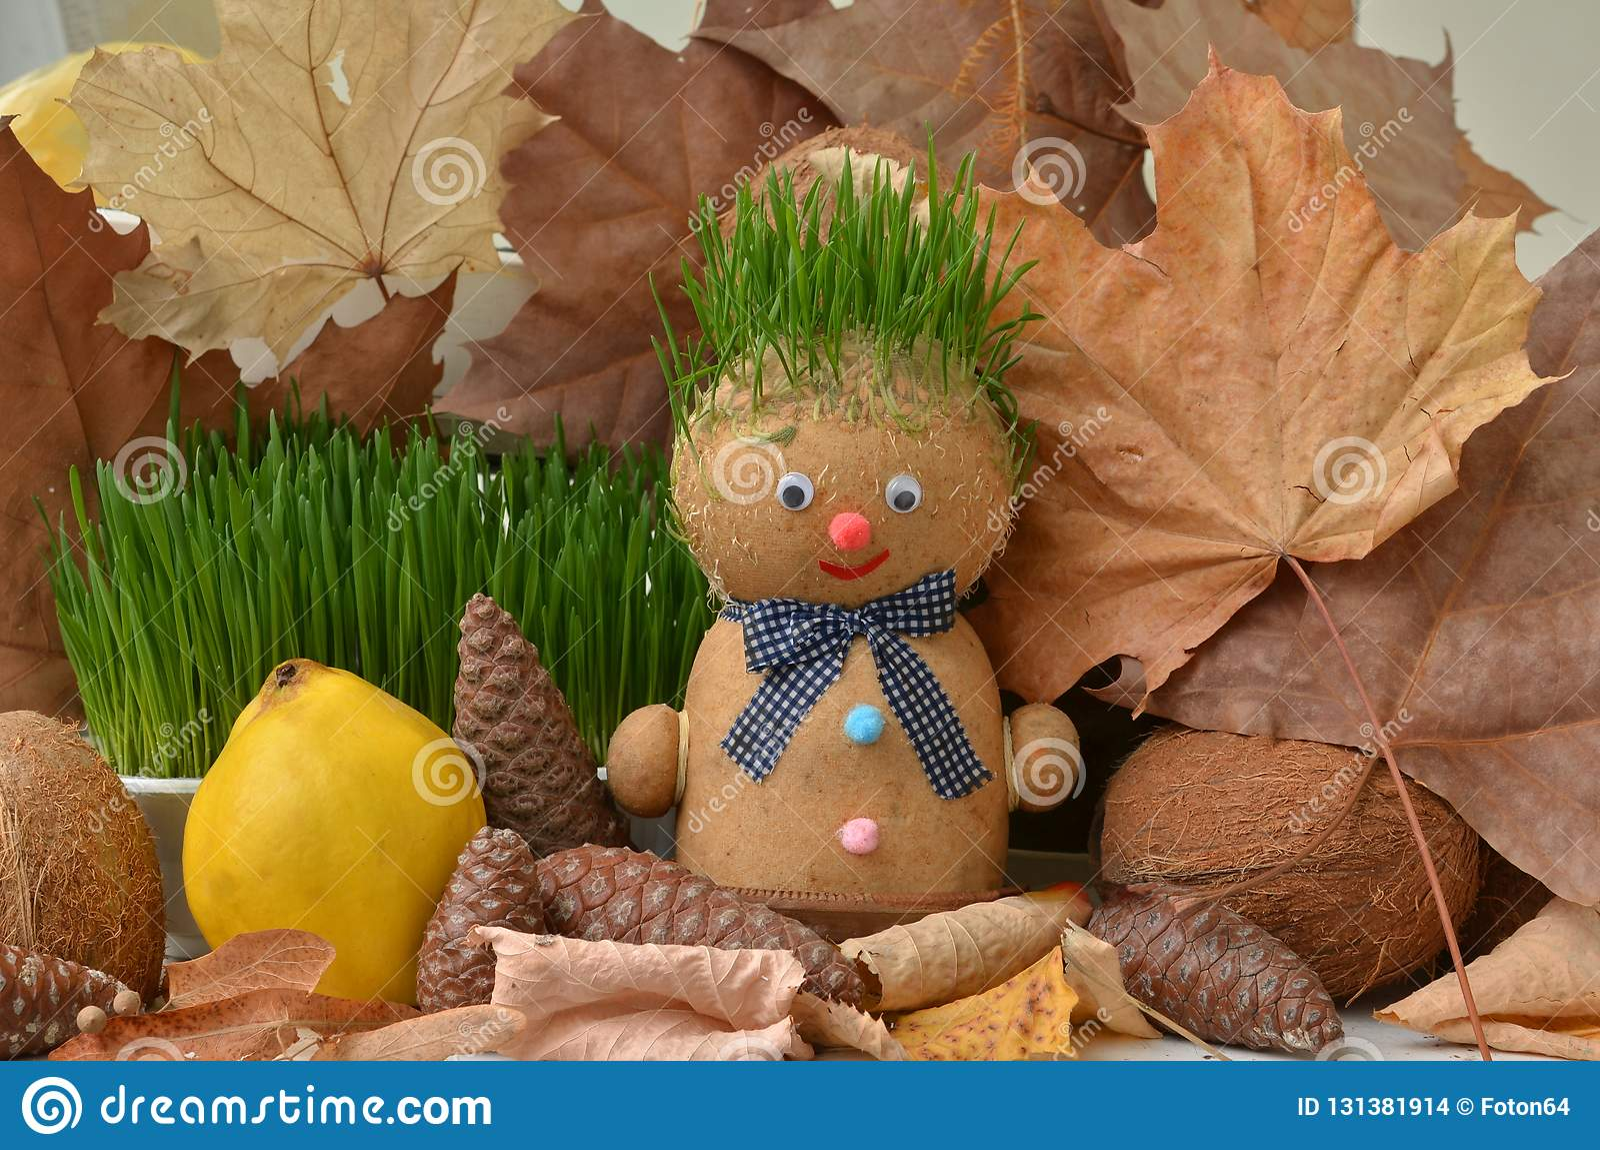 Handmade doll with green grass hair. Autumn still life.